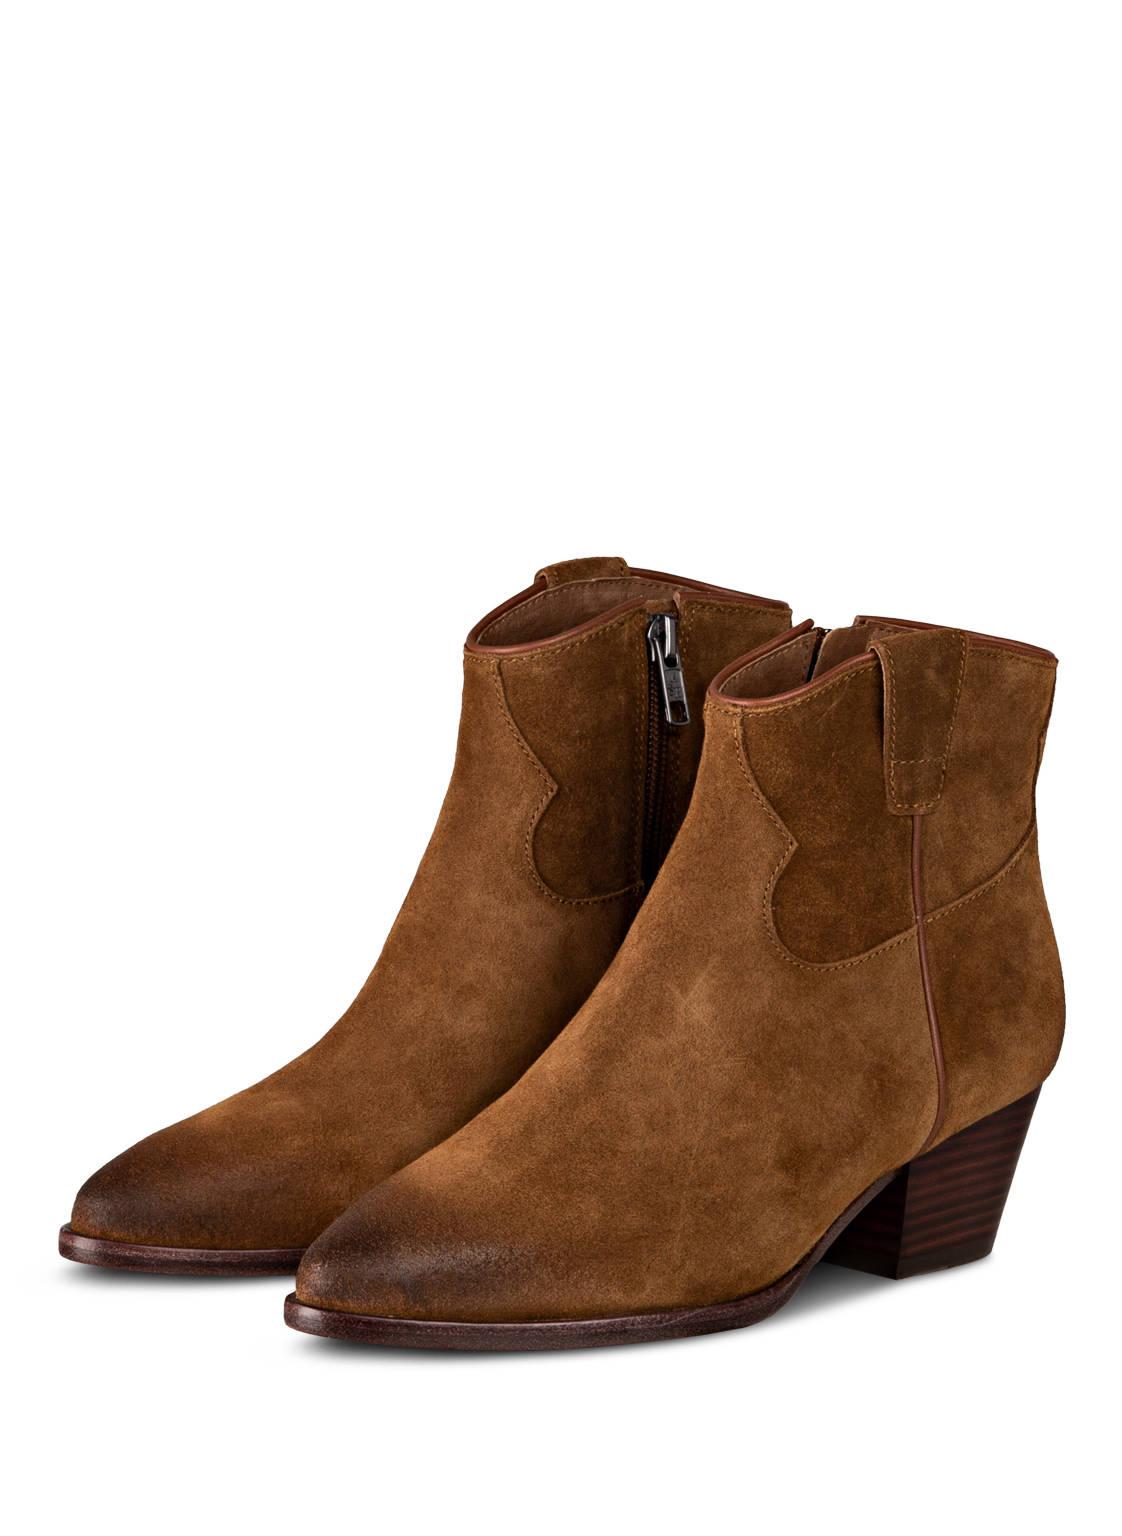 Image of Ash Cowboy Boots Houston braun